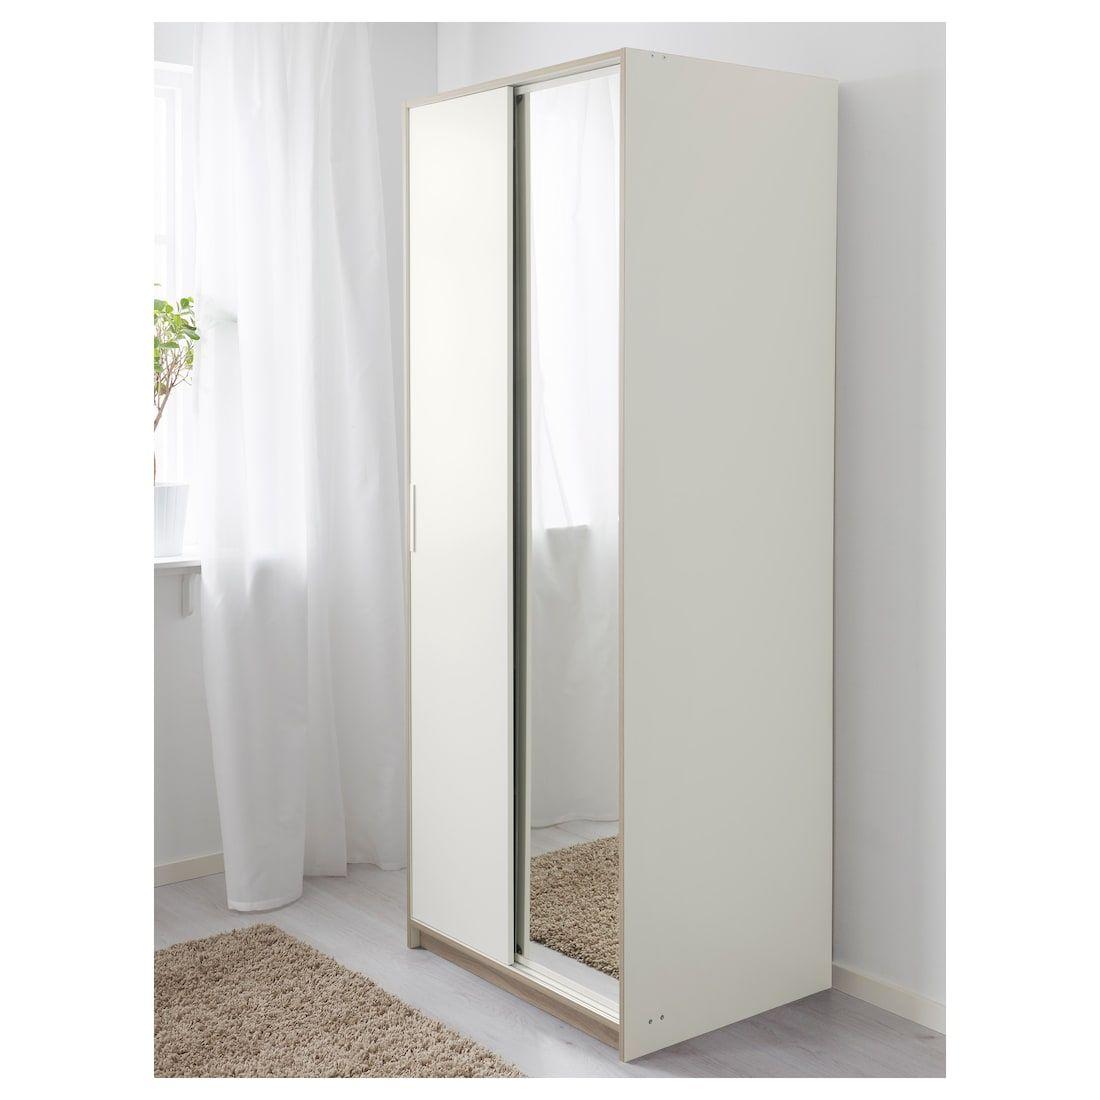 2019Ikea garderobe hvidspejl Garderobeskab TRYSIL i R34cjL5Aq